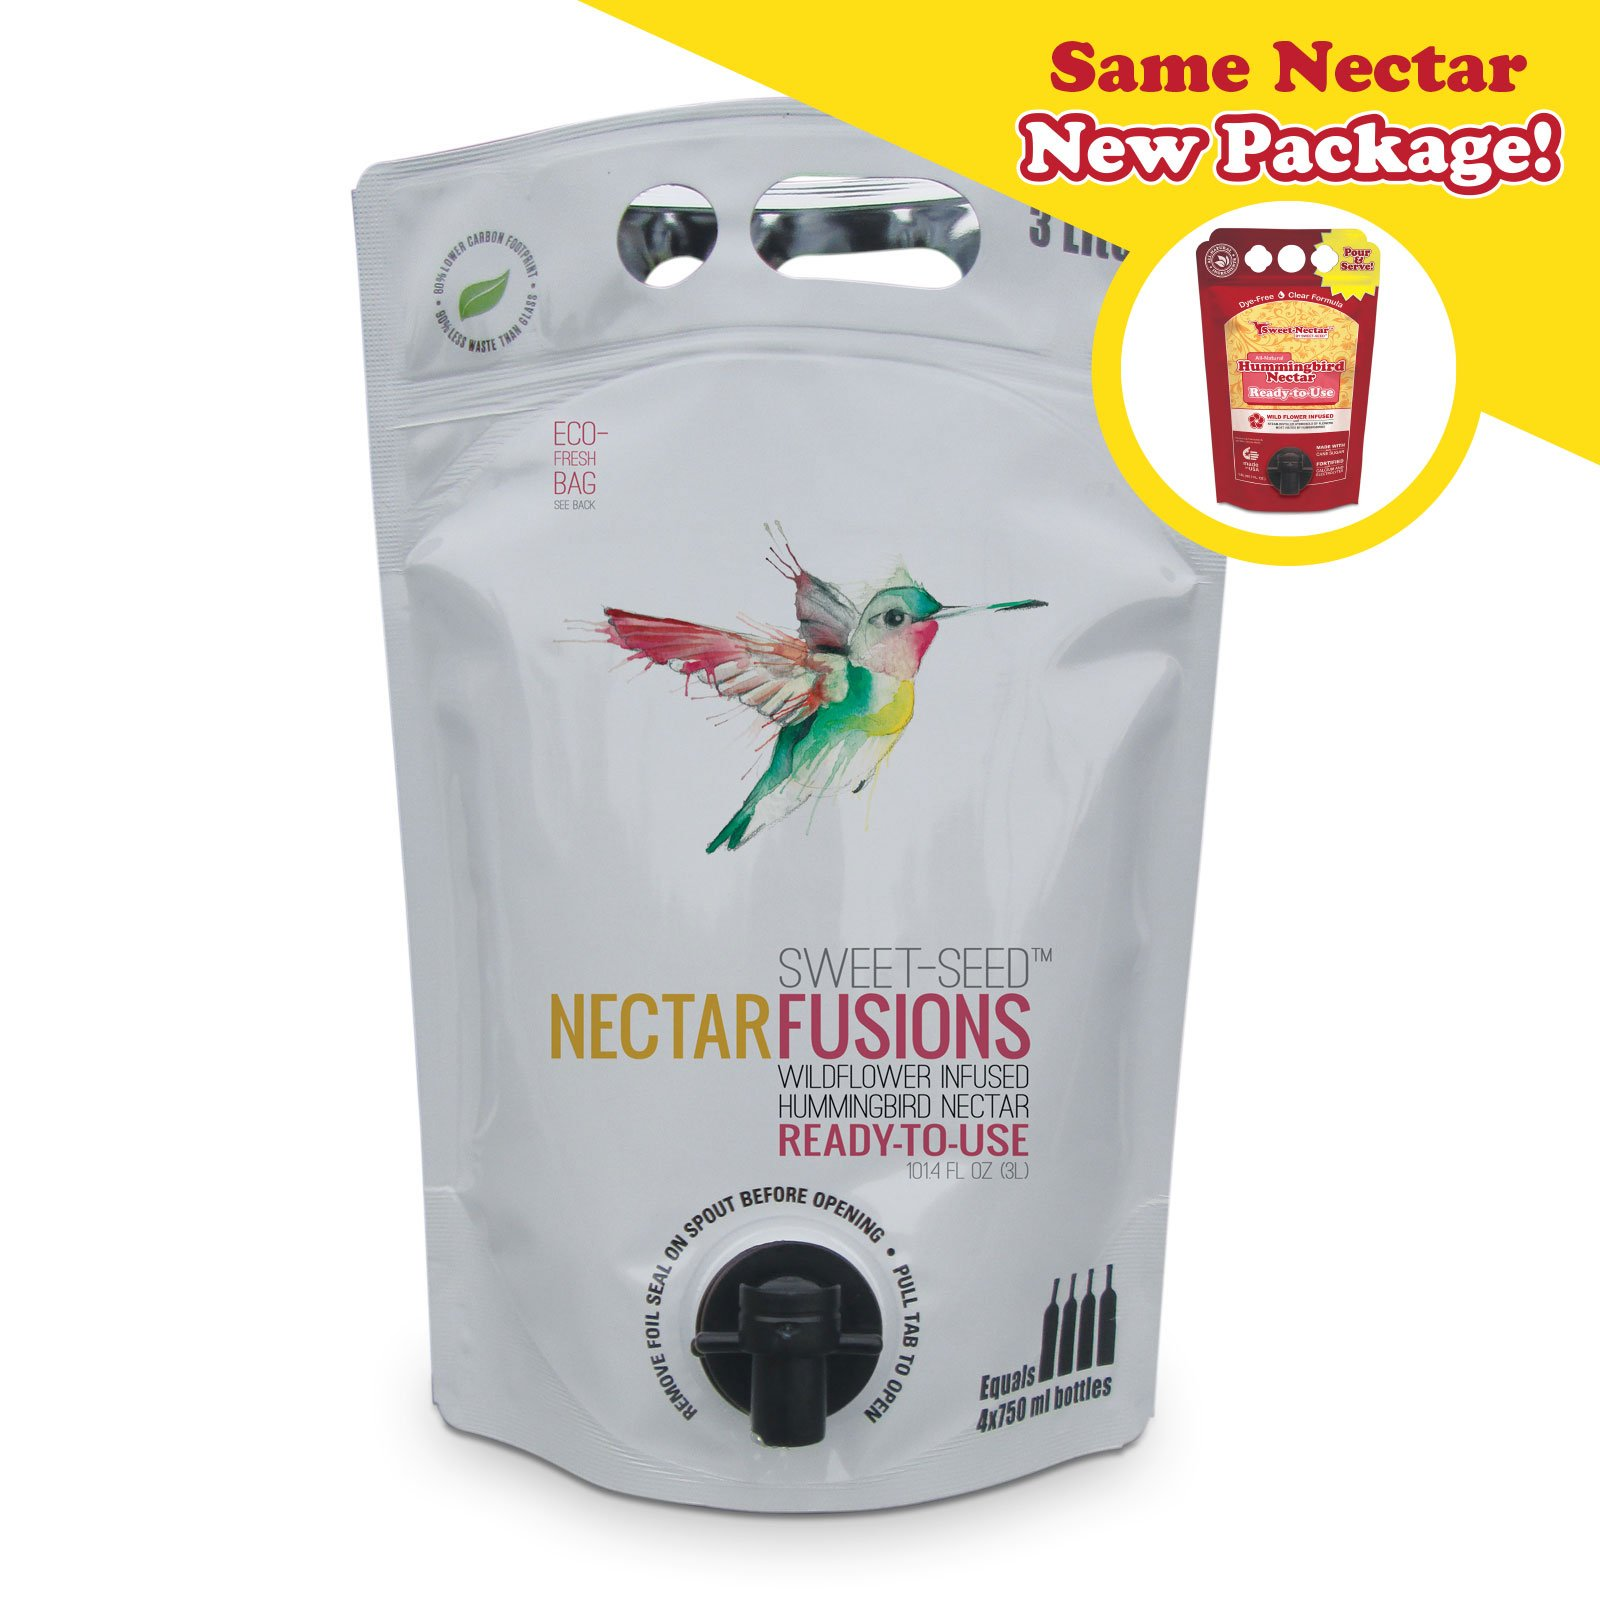 Sweet-Seed, LLC Nectar Fusions Hummingbird Food: All-natural & Dye Free, Wildflower Infused Hummingbird Nectar (100 oz. Ready-to-use Formula)